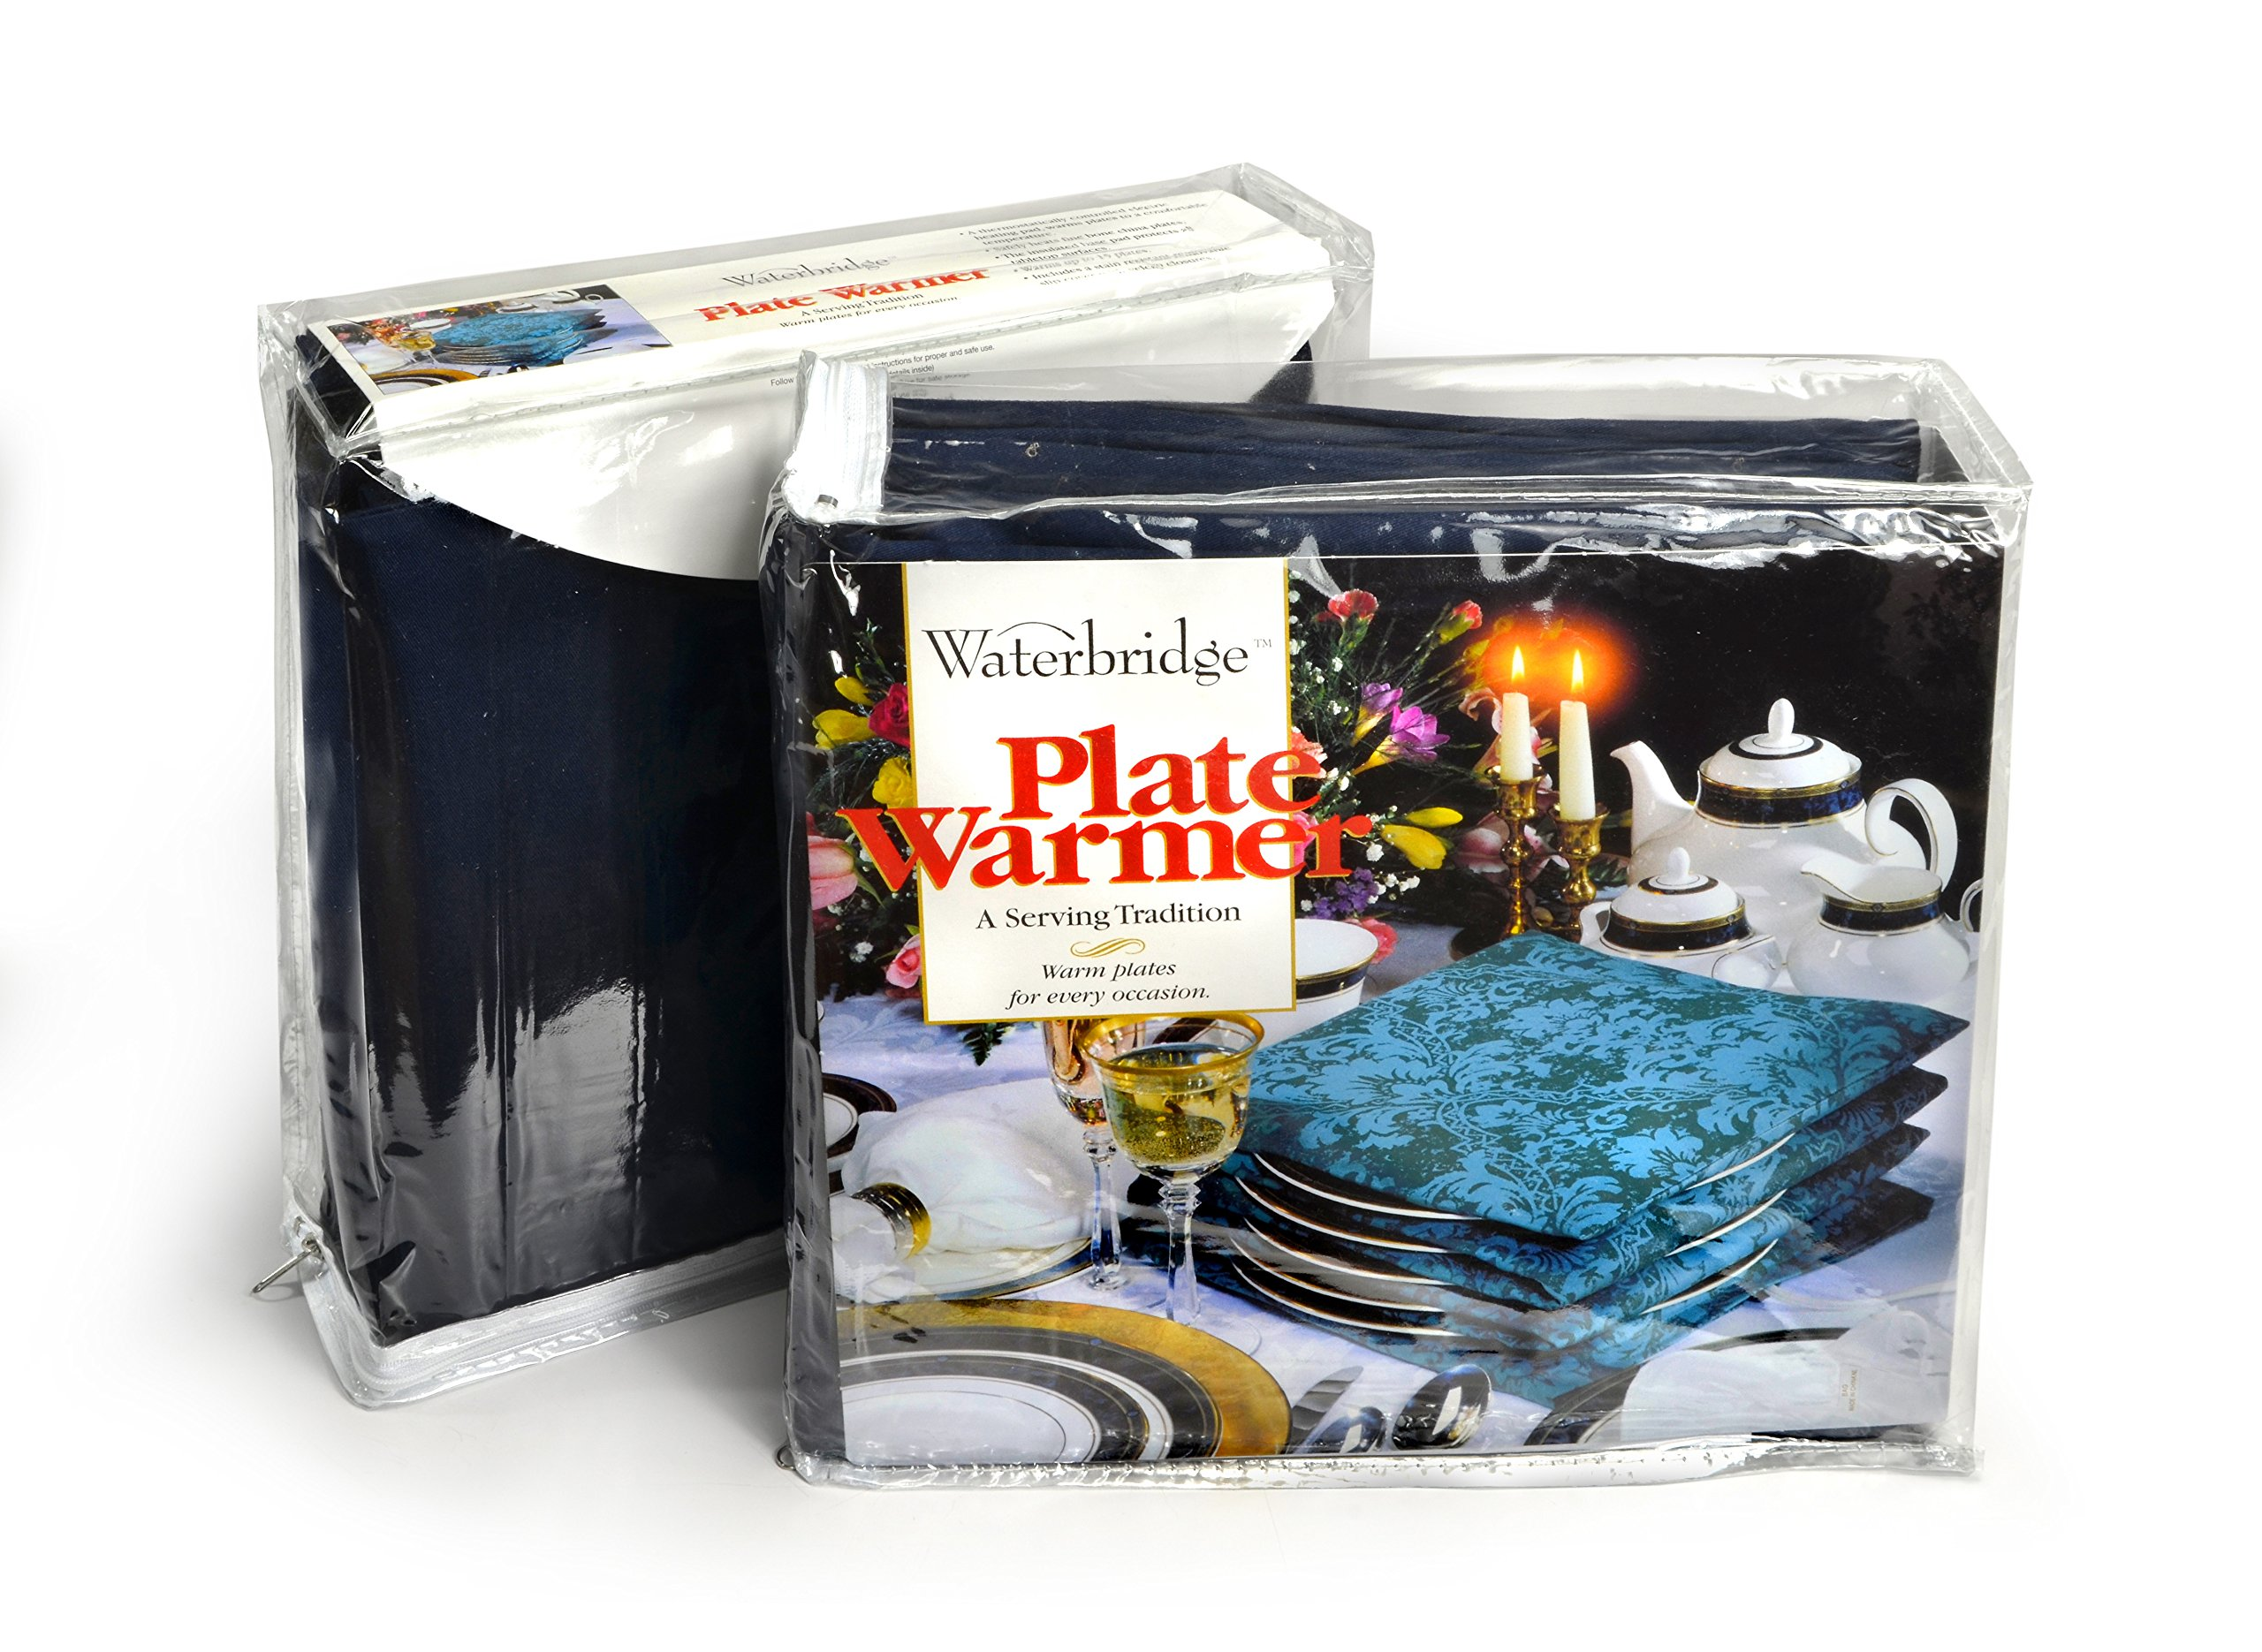 Waterbridge Electric Plate Warmer - Heats up to 15 Large Plates - Crimson Damask